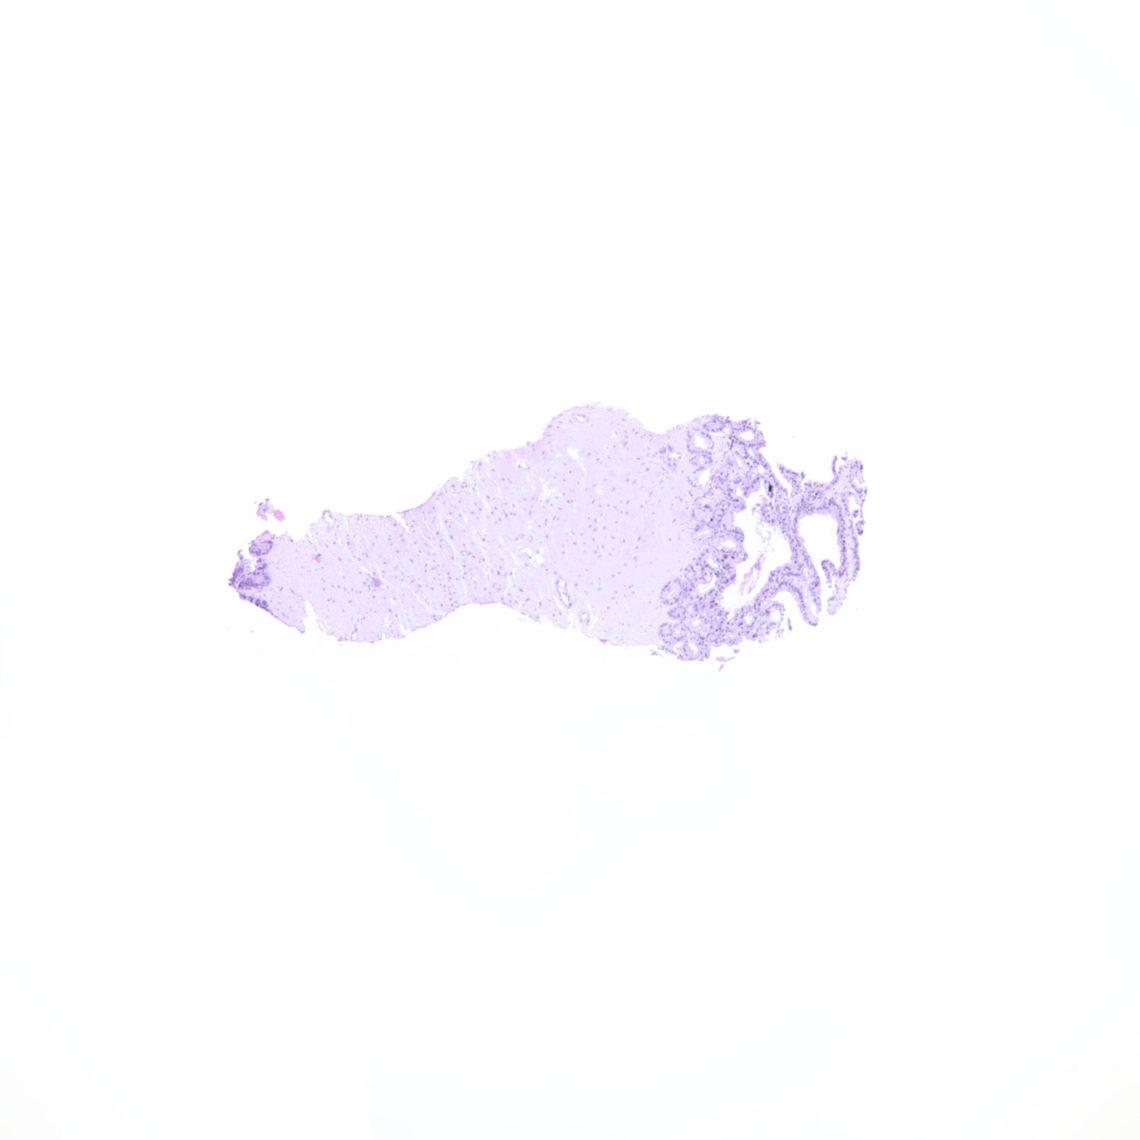 ves-9524_95-5x